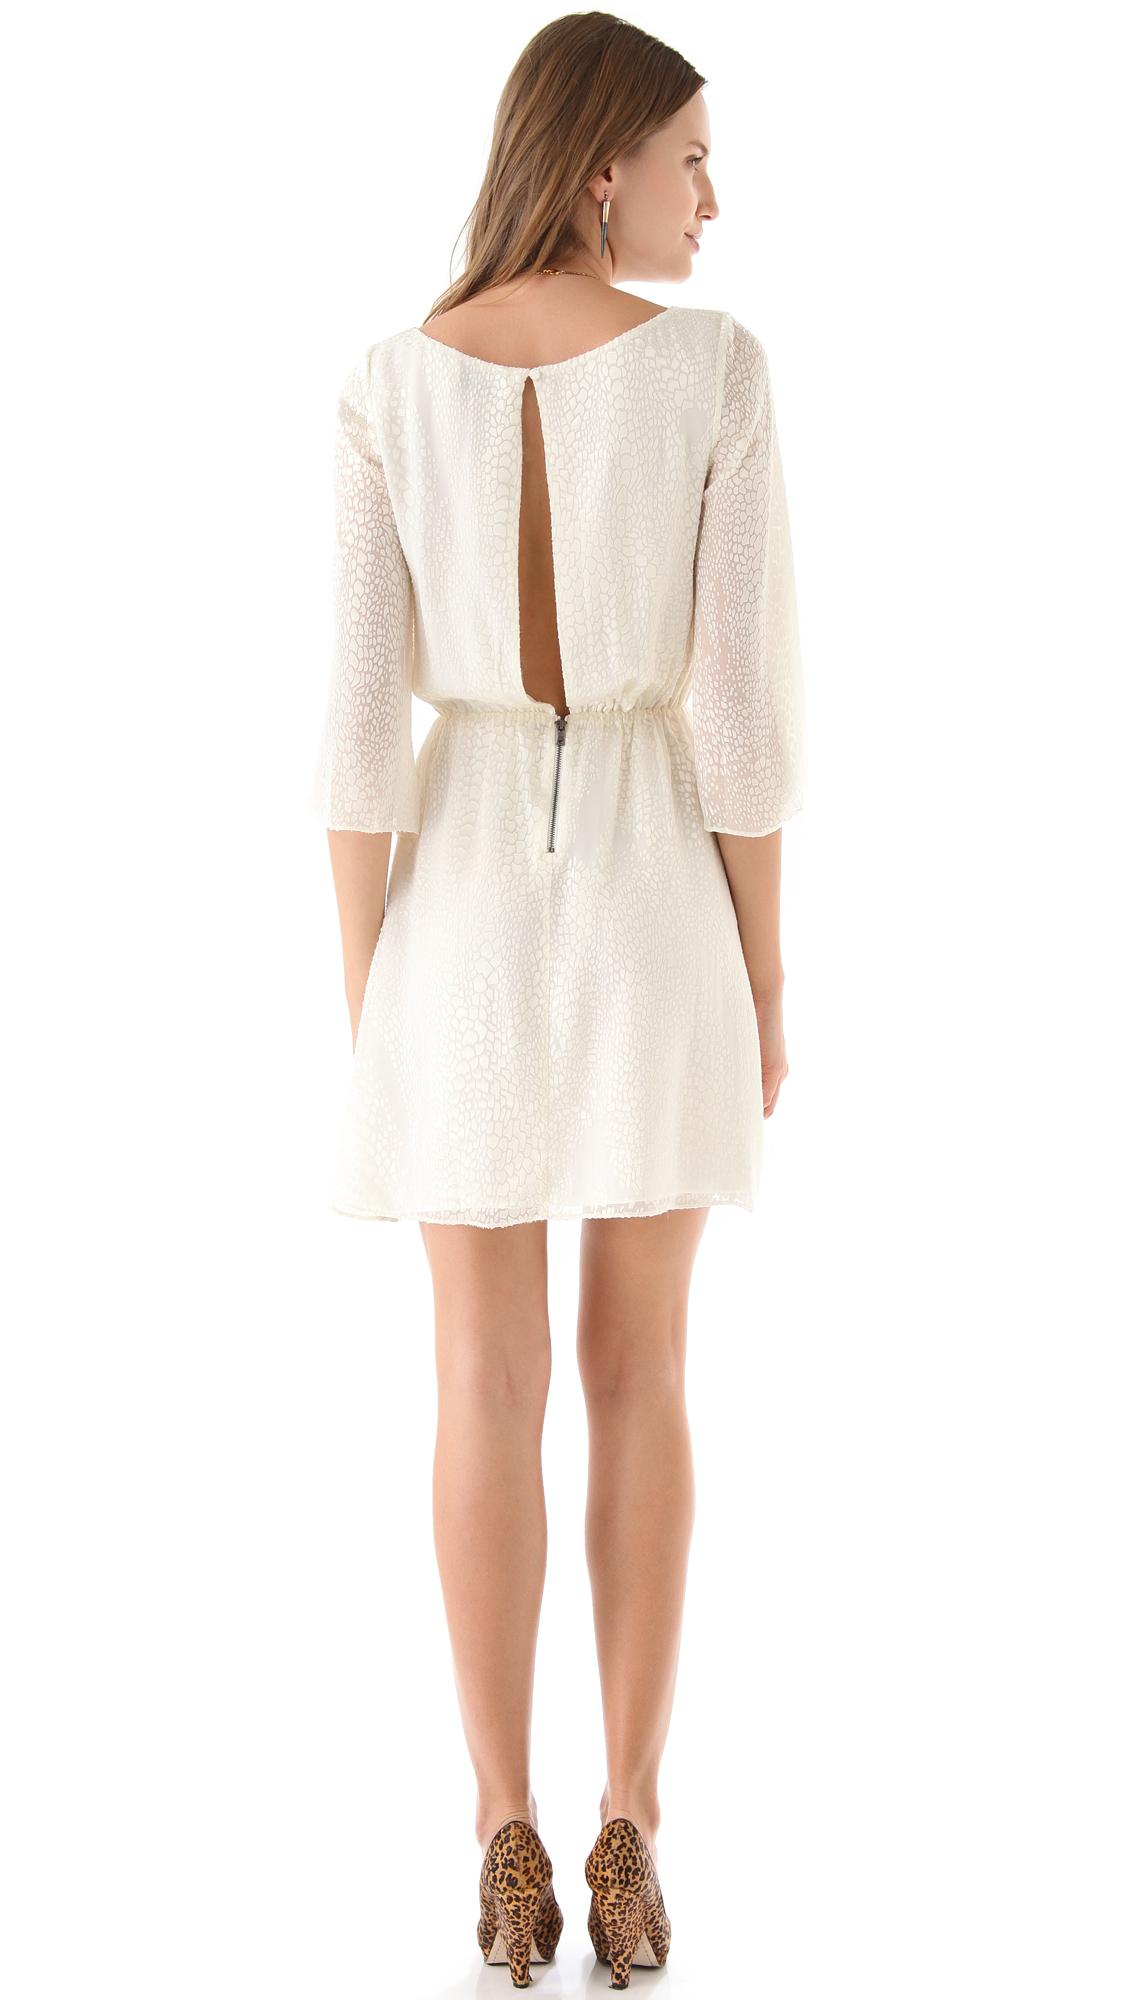 Alice olivia Marika Bell Sleeve Dress in White Lyst